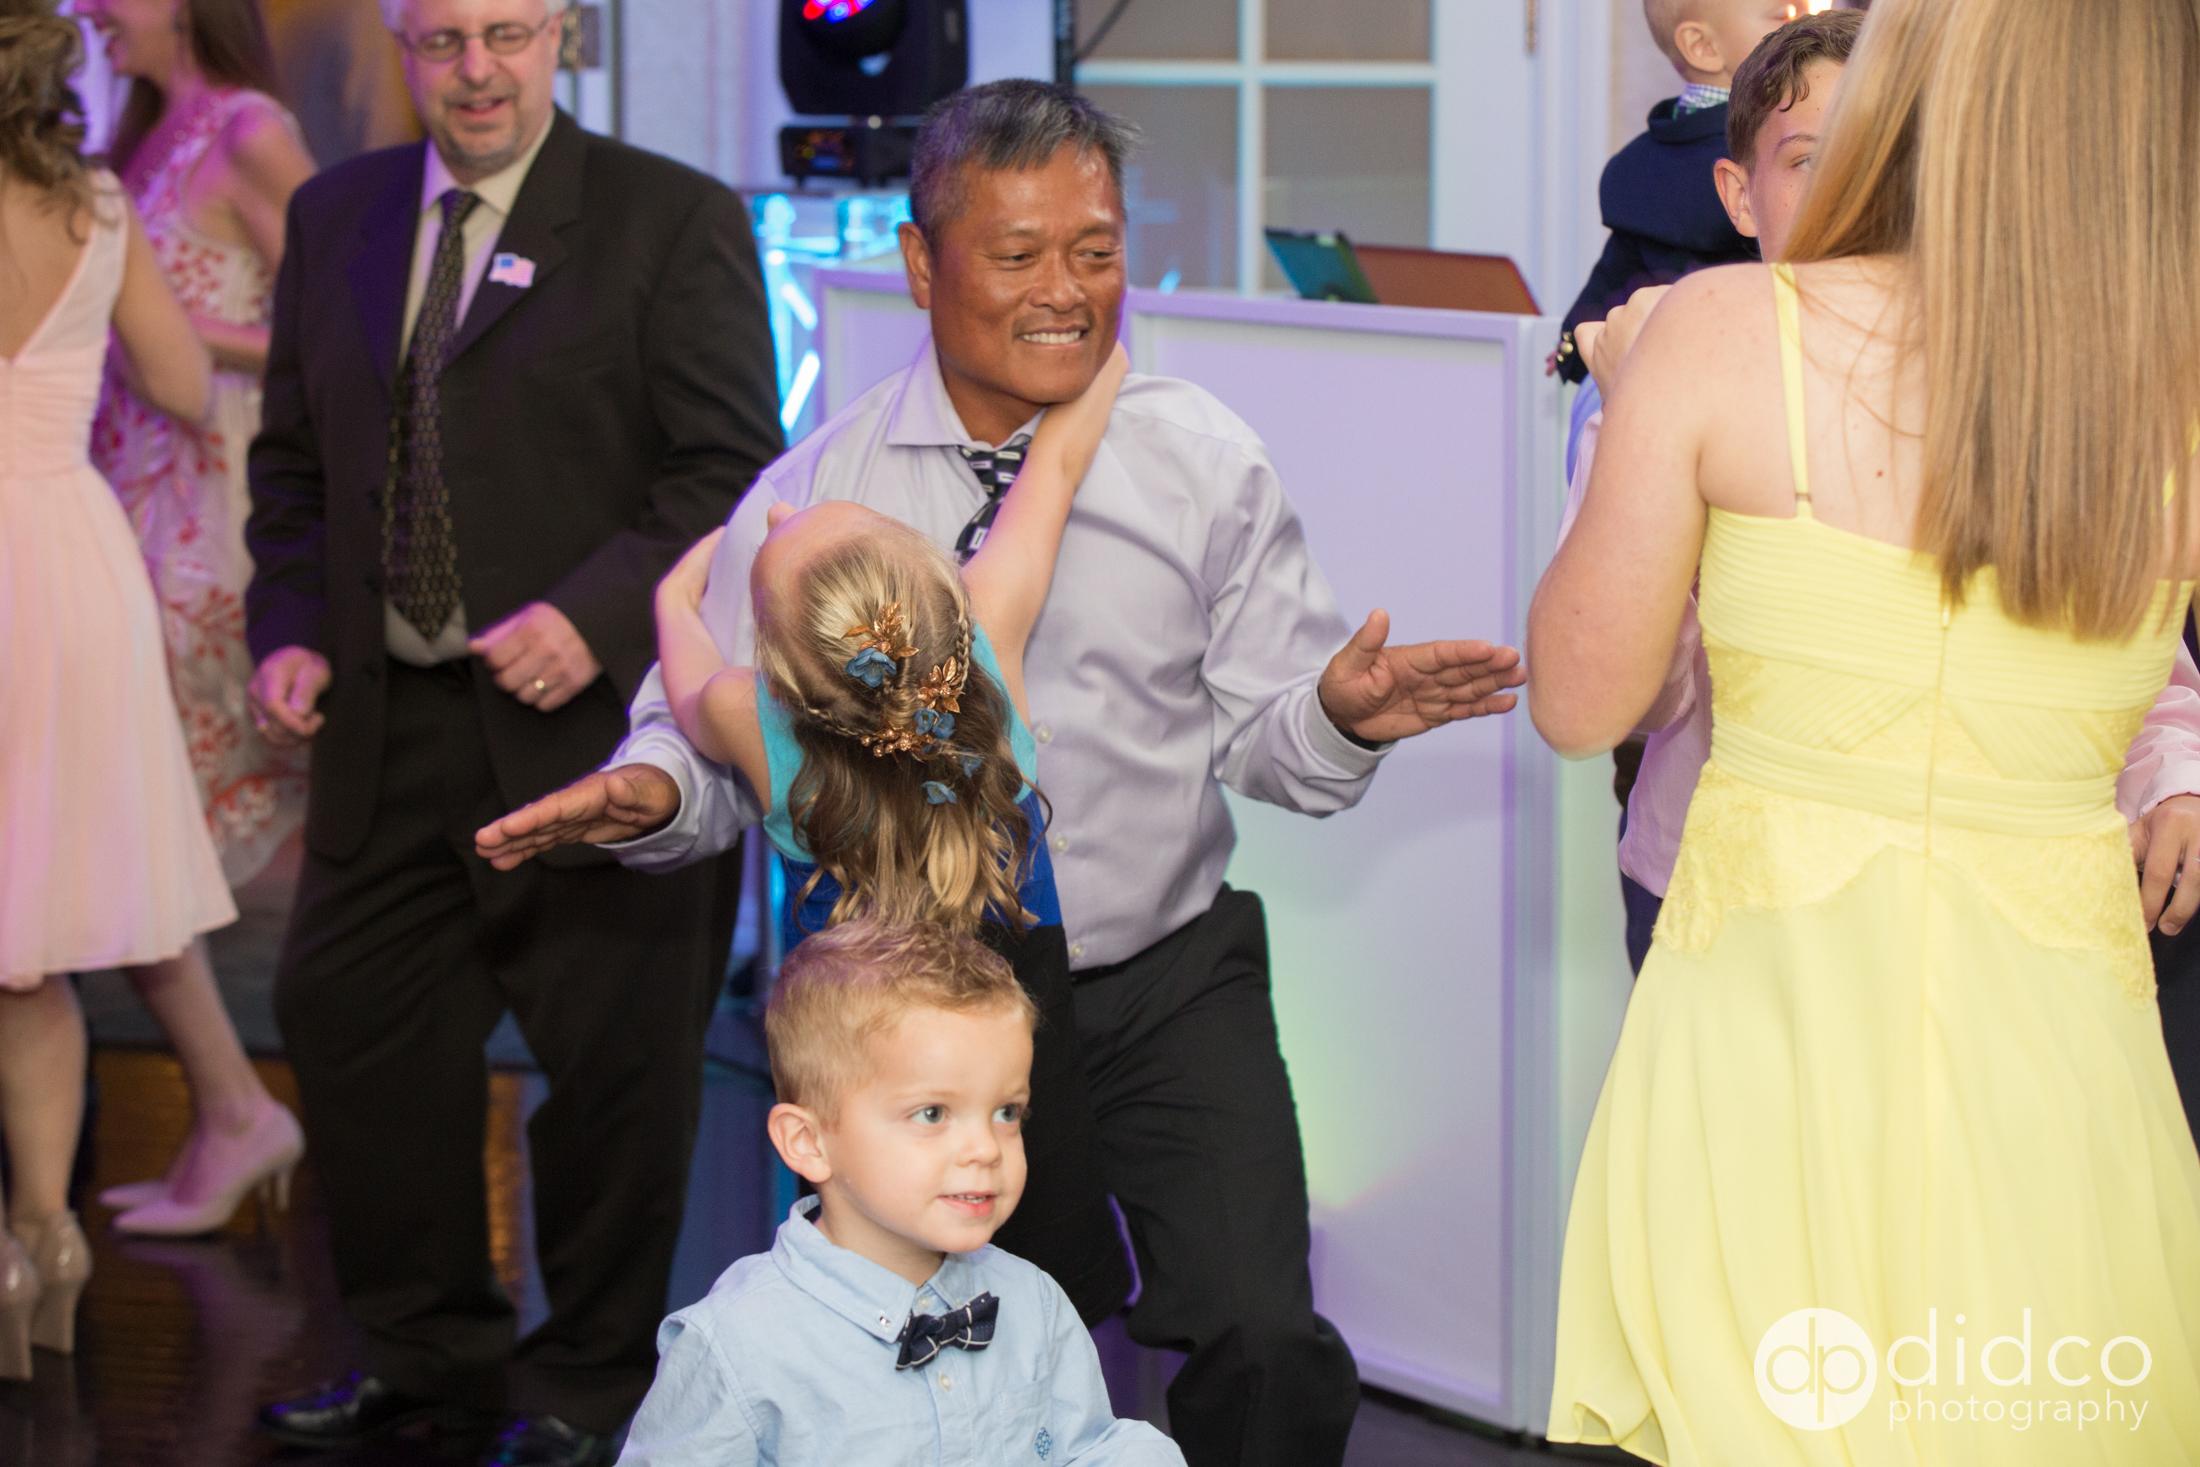 Allentown PA Wedding DJ Service